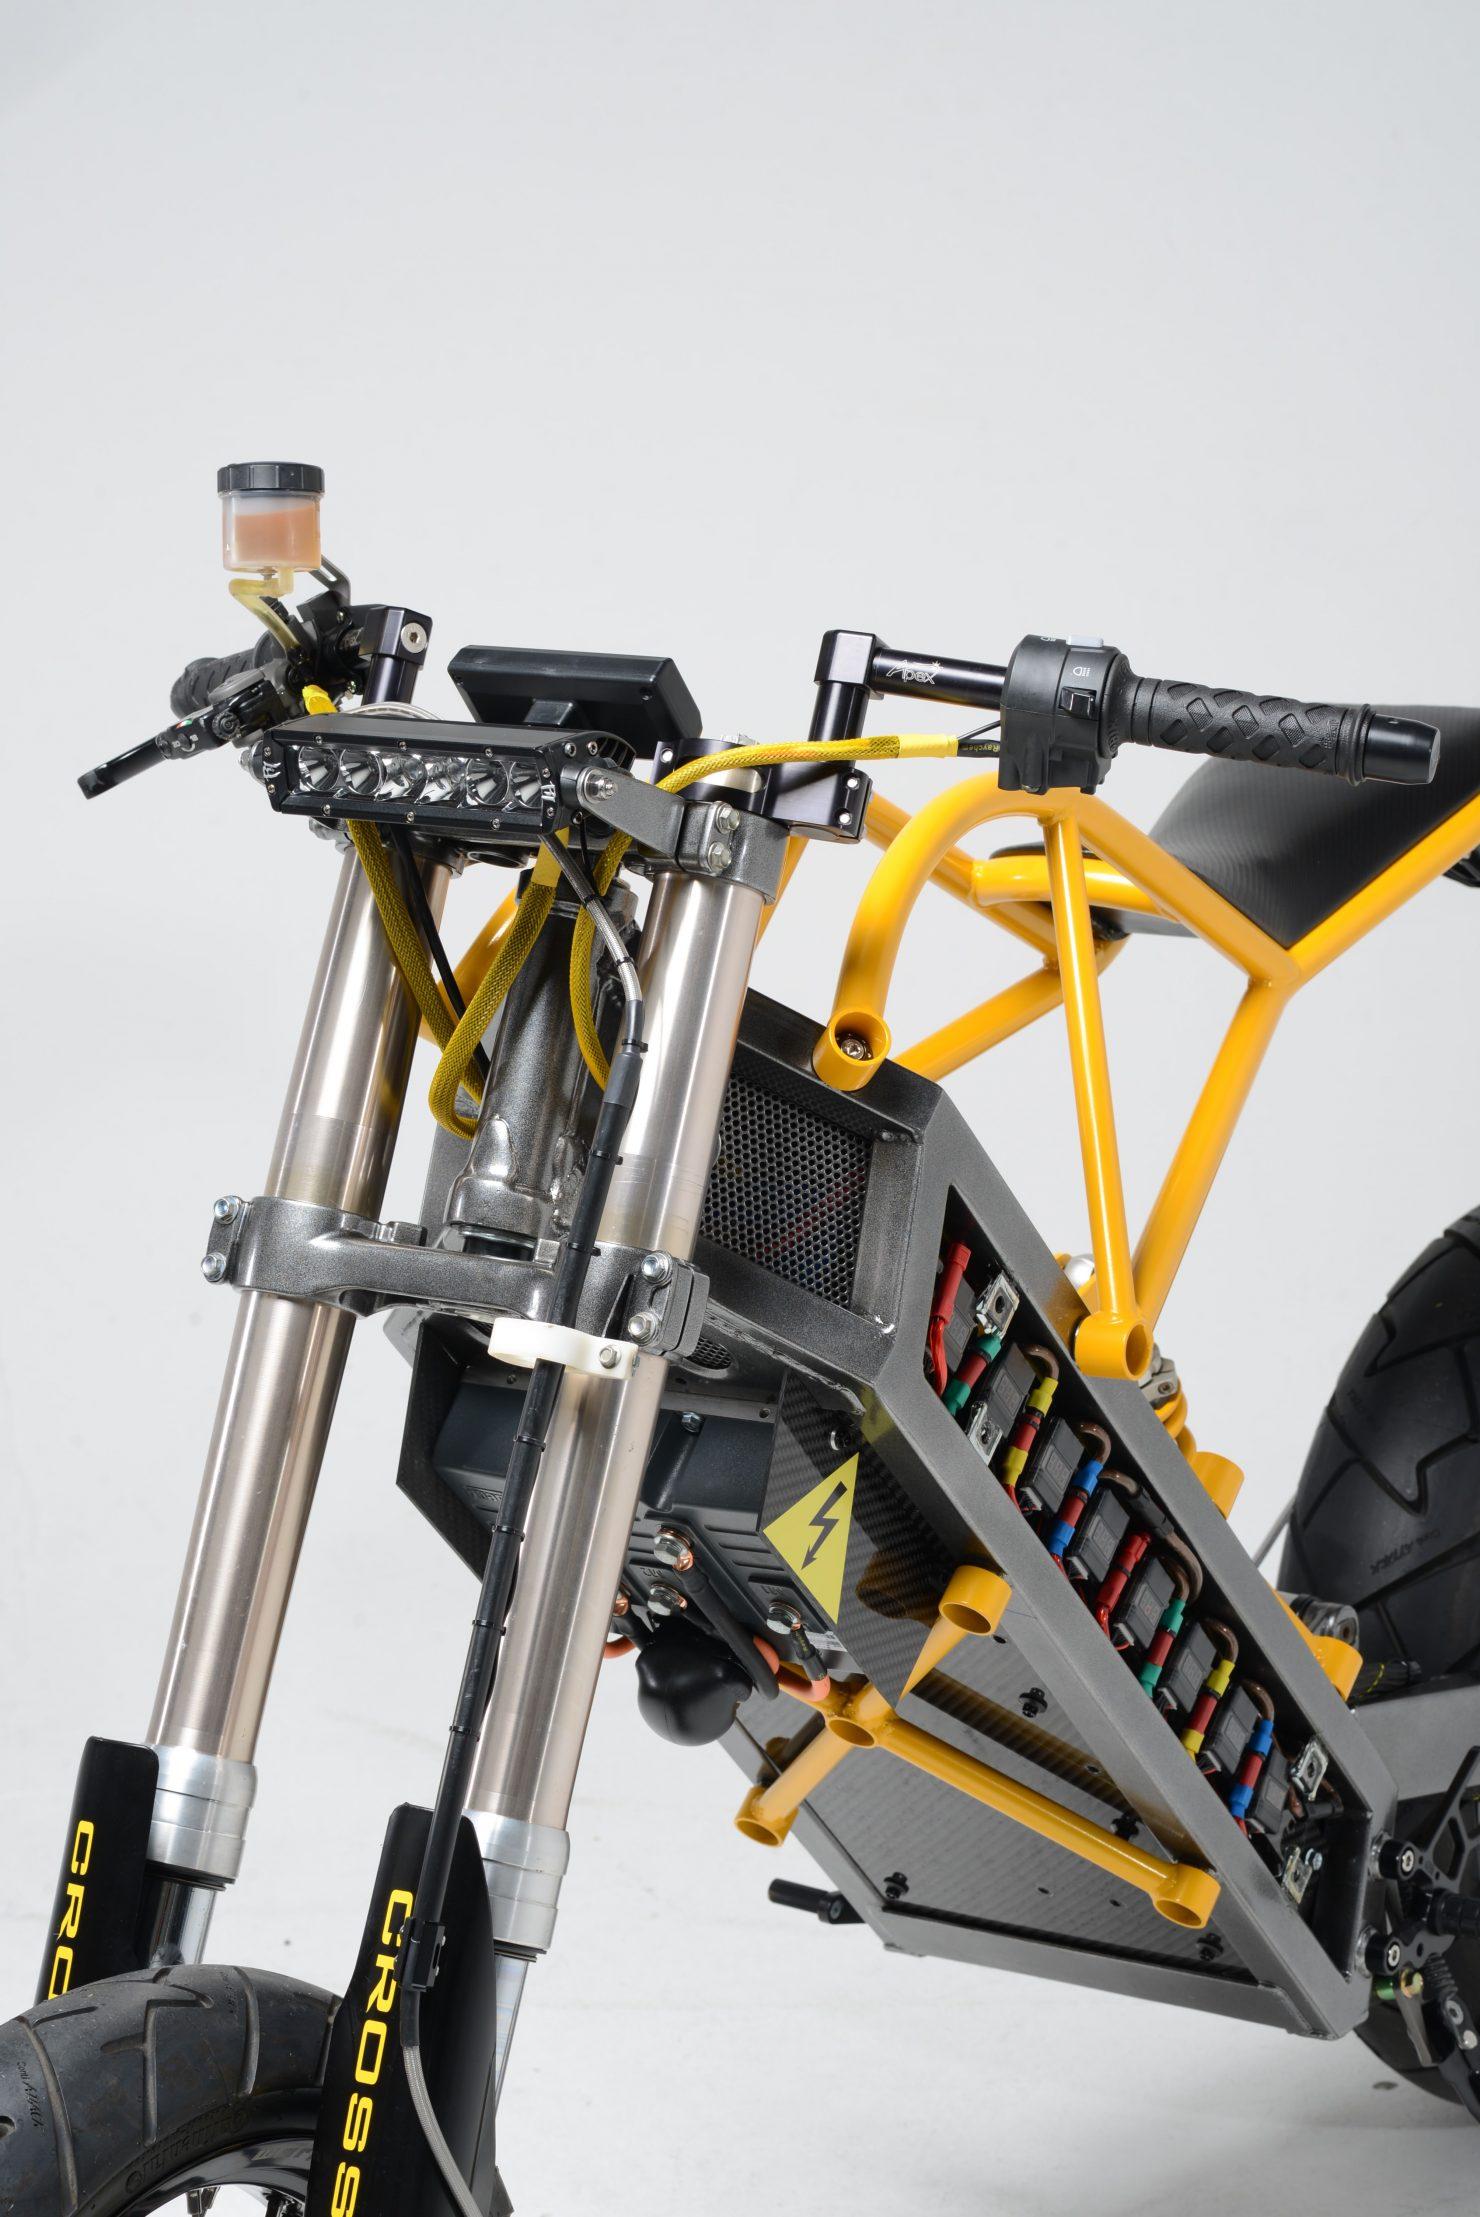 ExoDyne Electric Motorcycle 8 1480x2217 - ExoDyne Electric Motorcycle